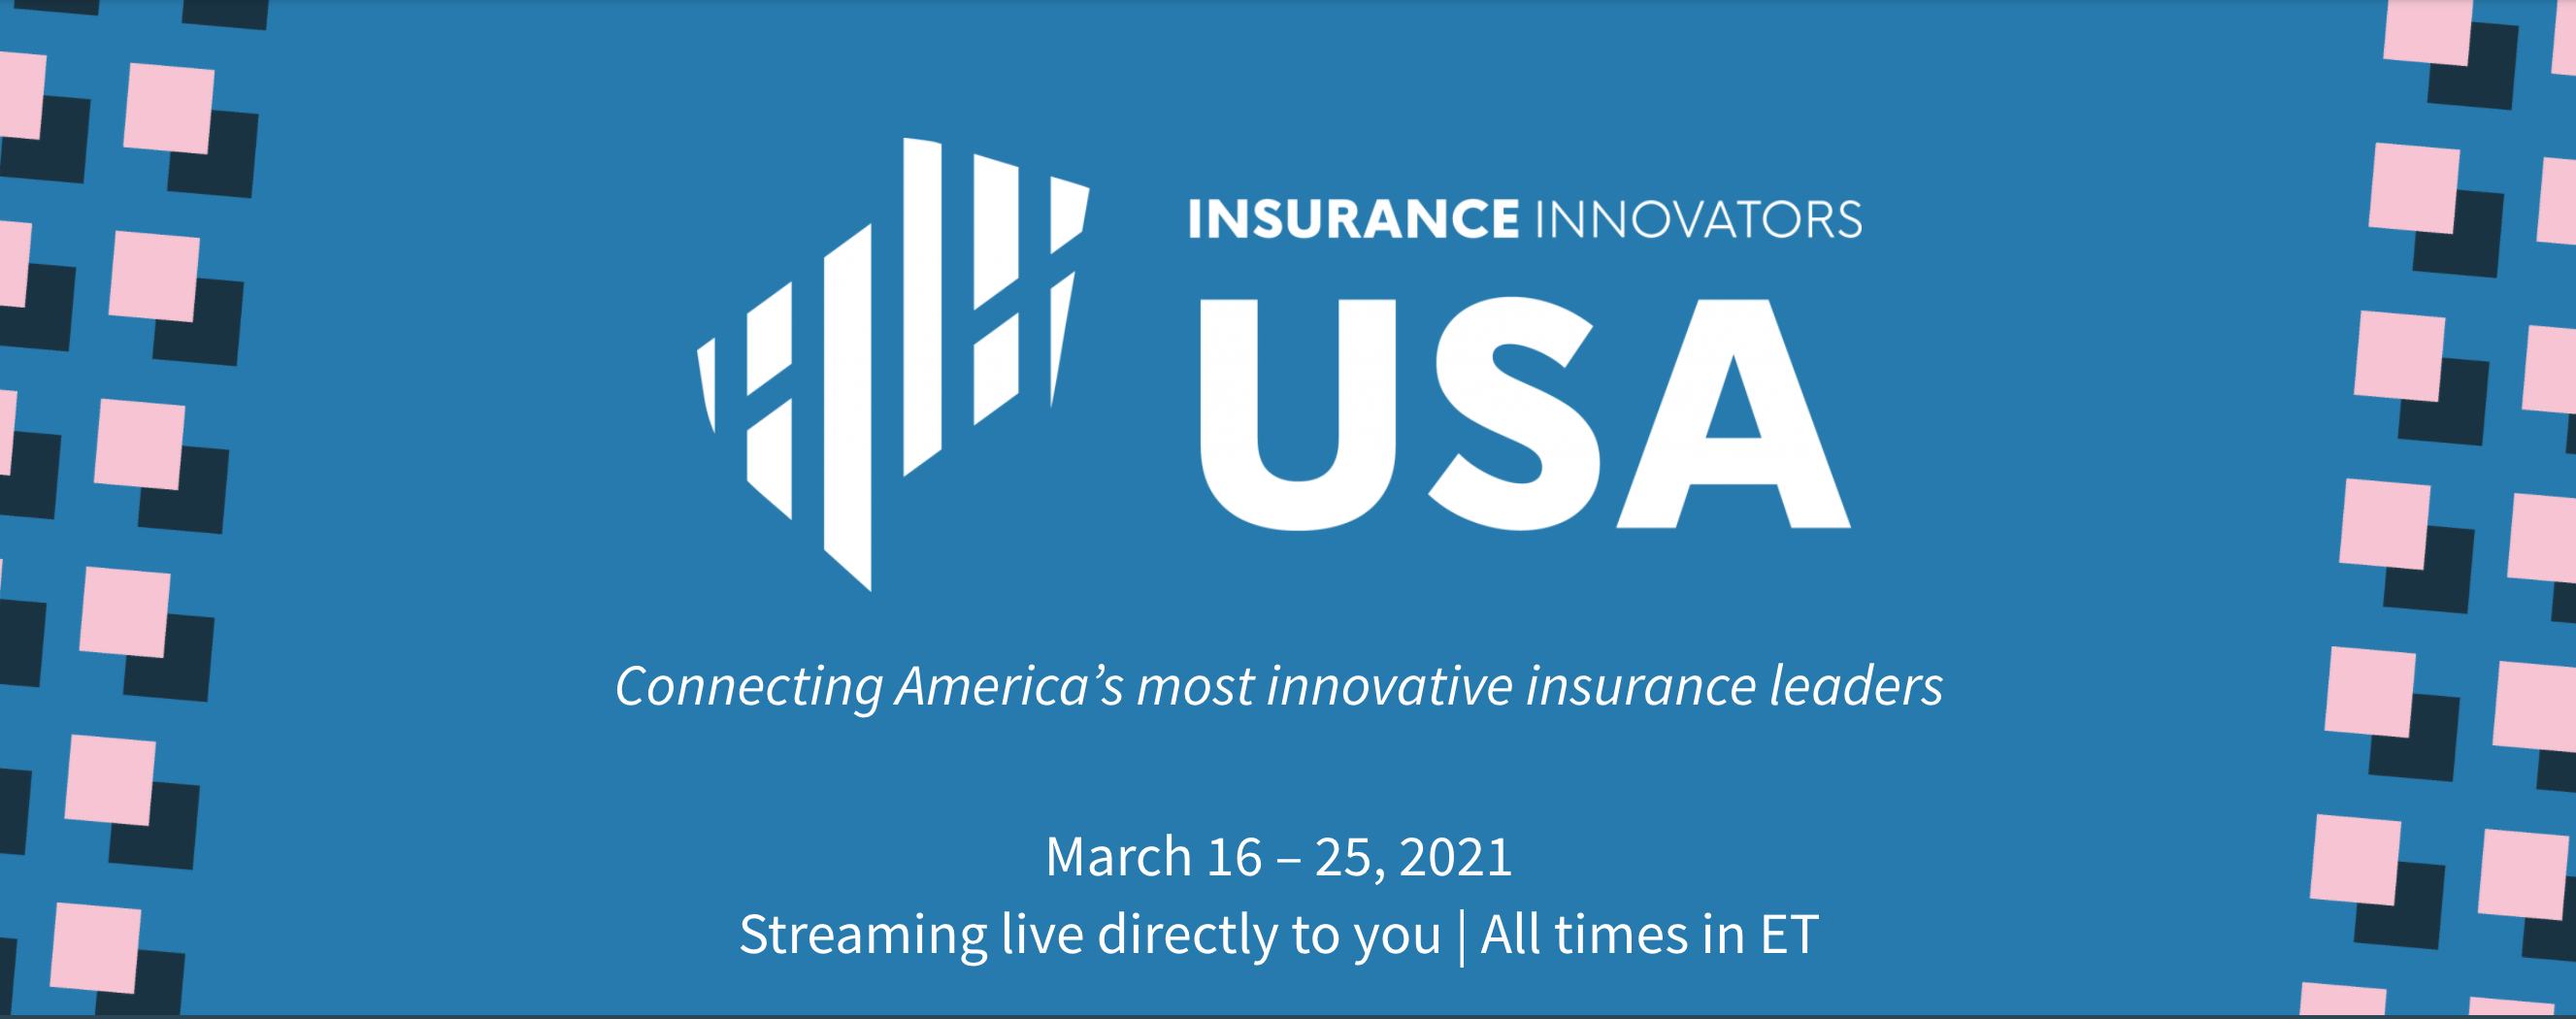 Insurance Innovators USA